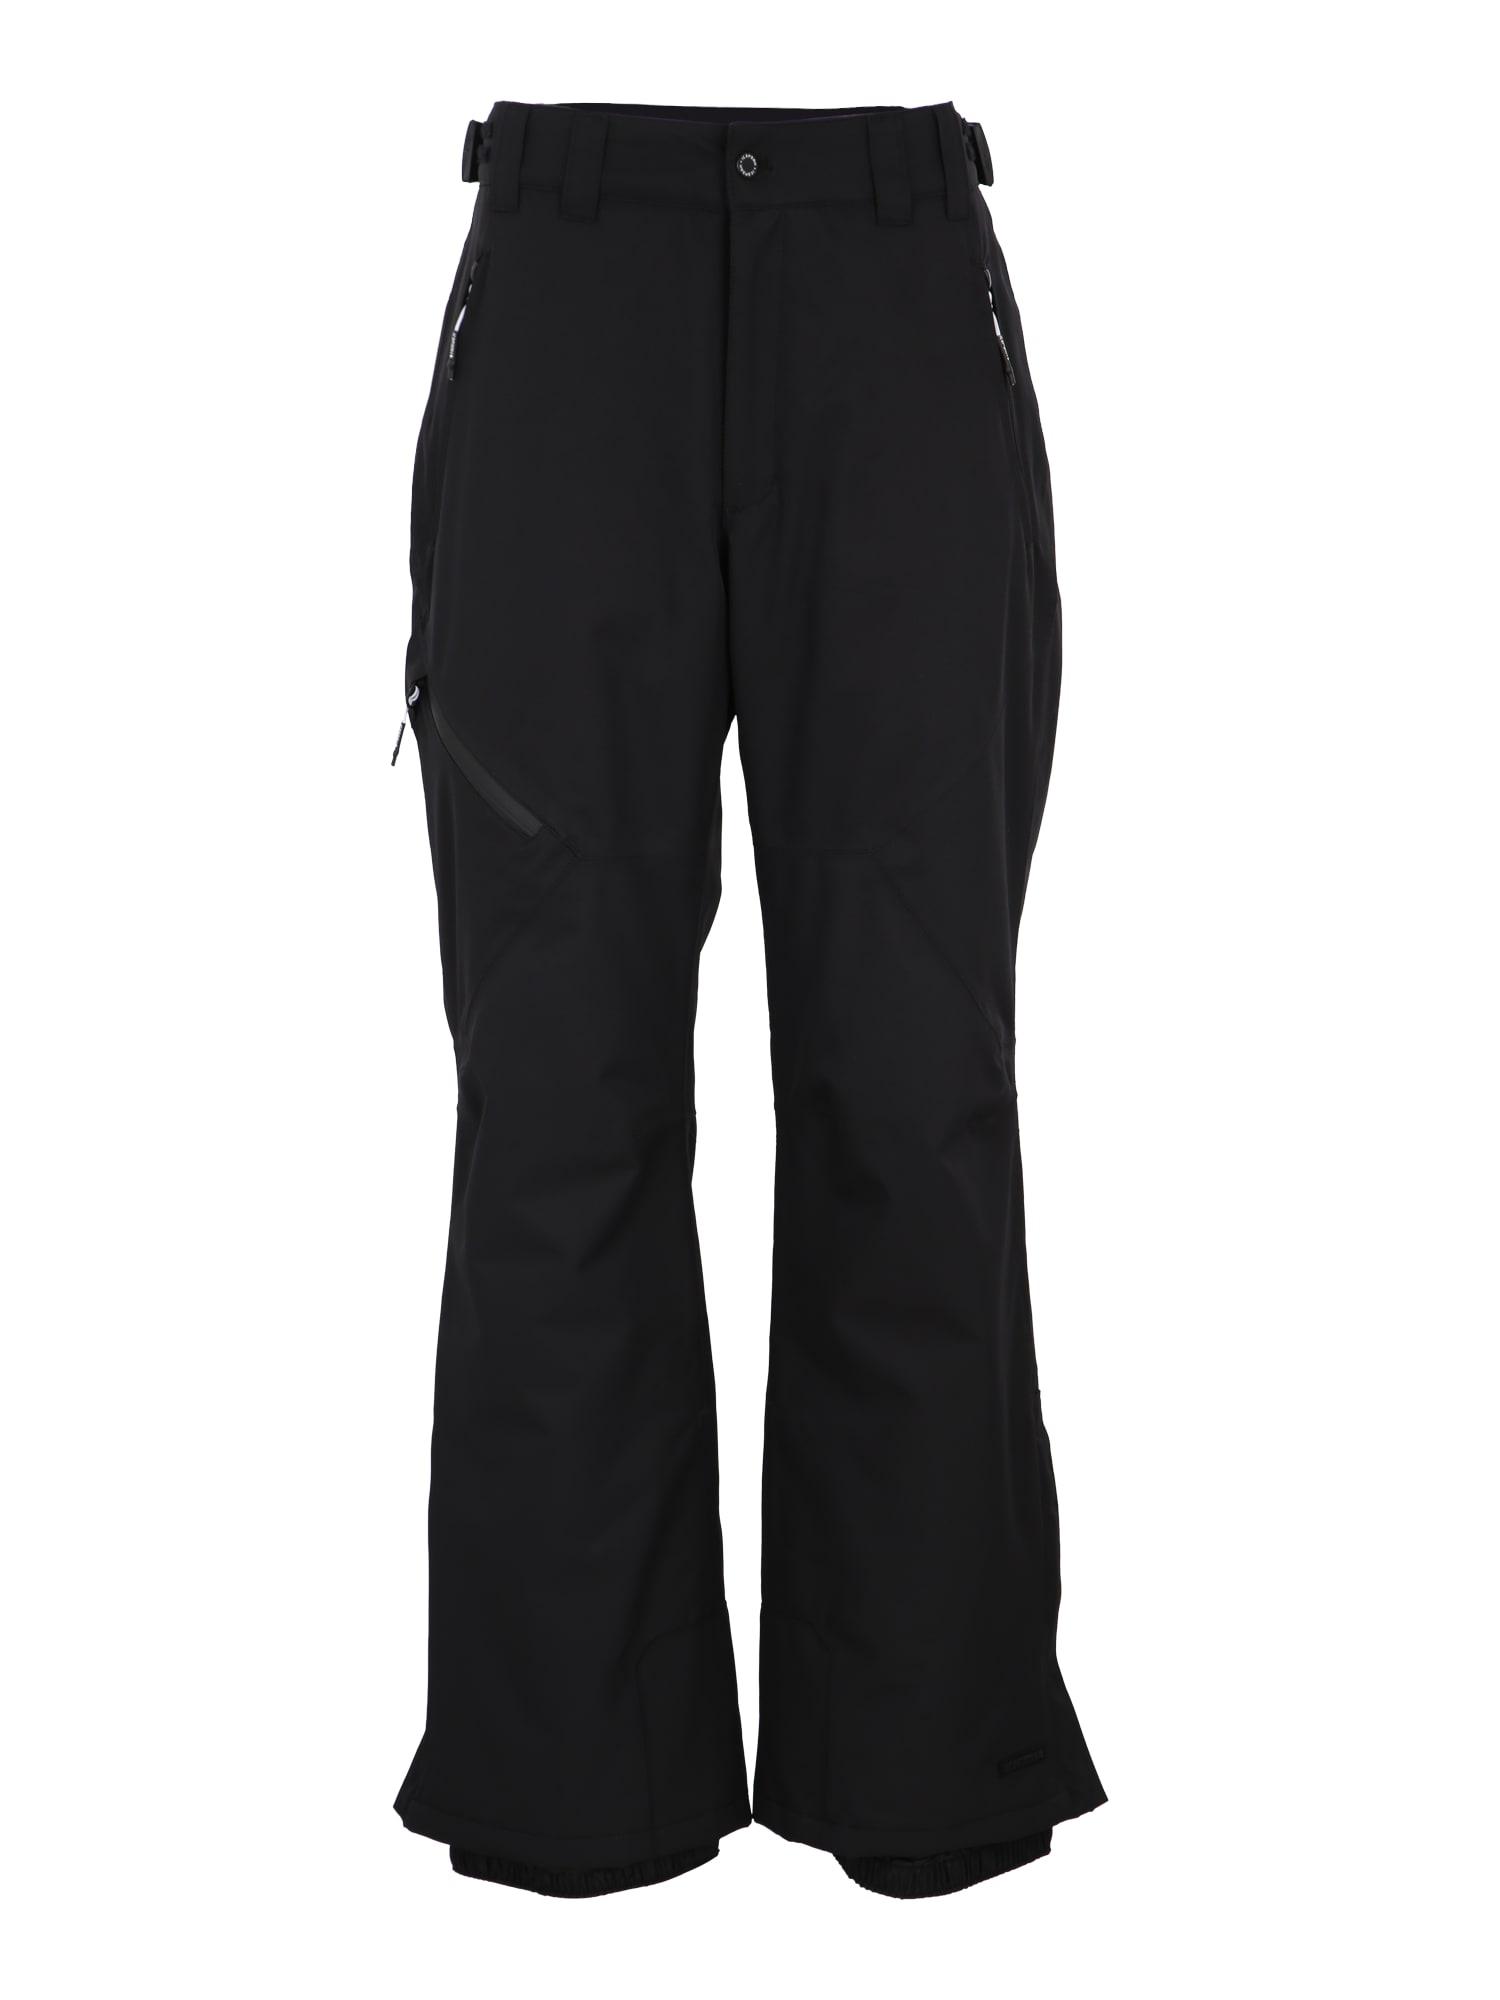 Skihose 'Johny' | Sportbekleidung > Sporthosen > Skihosen | icepeak